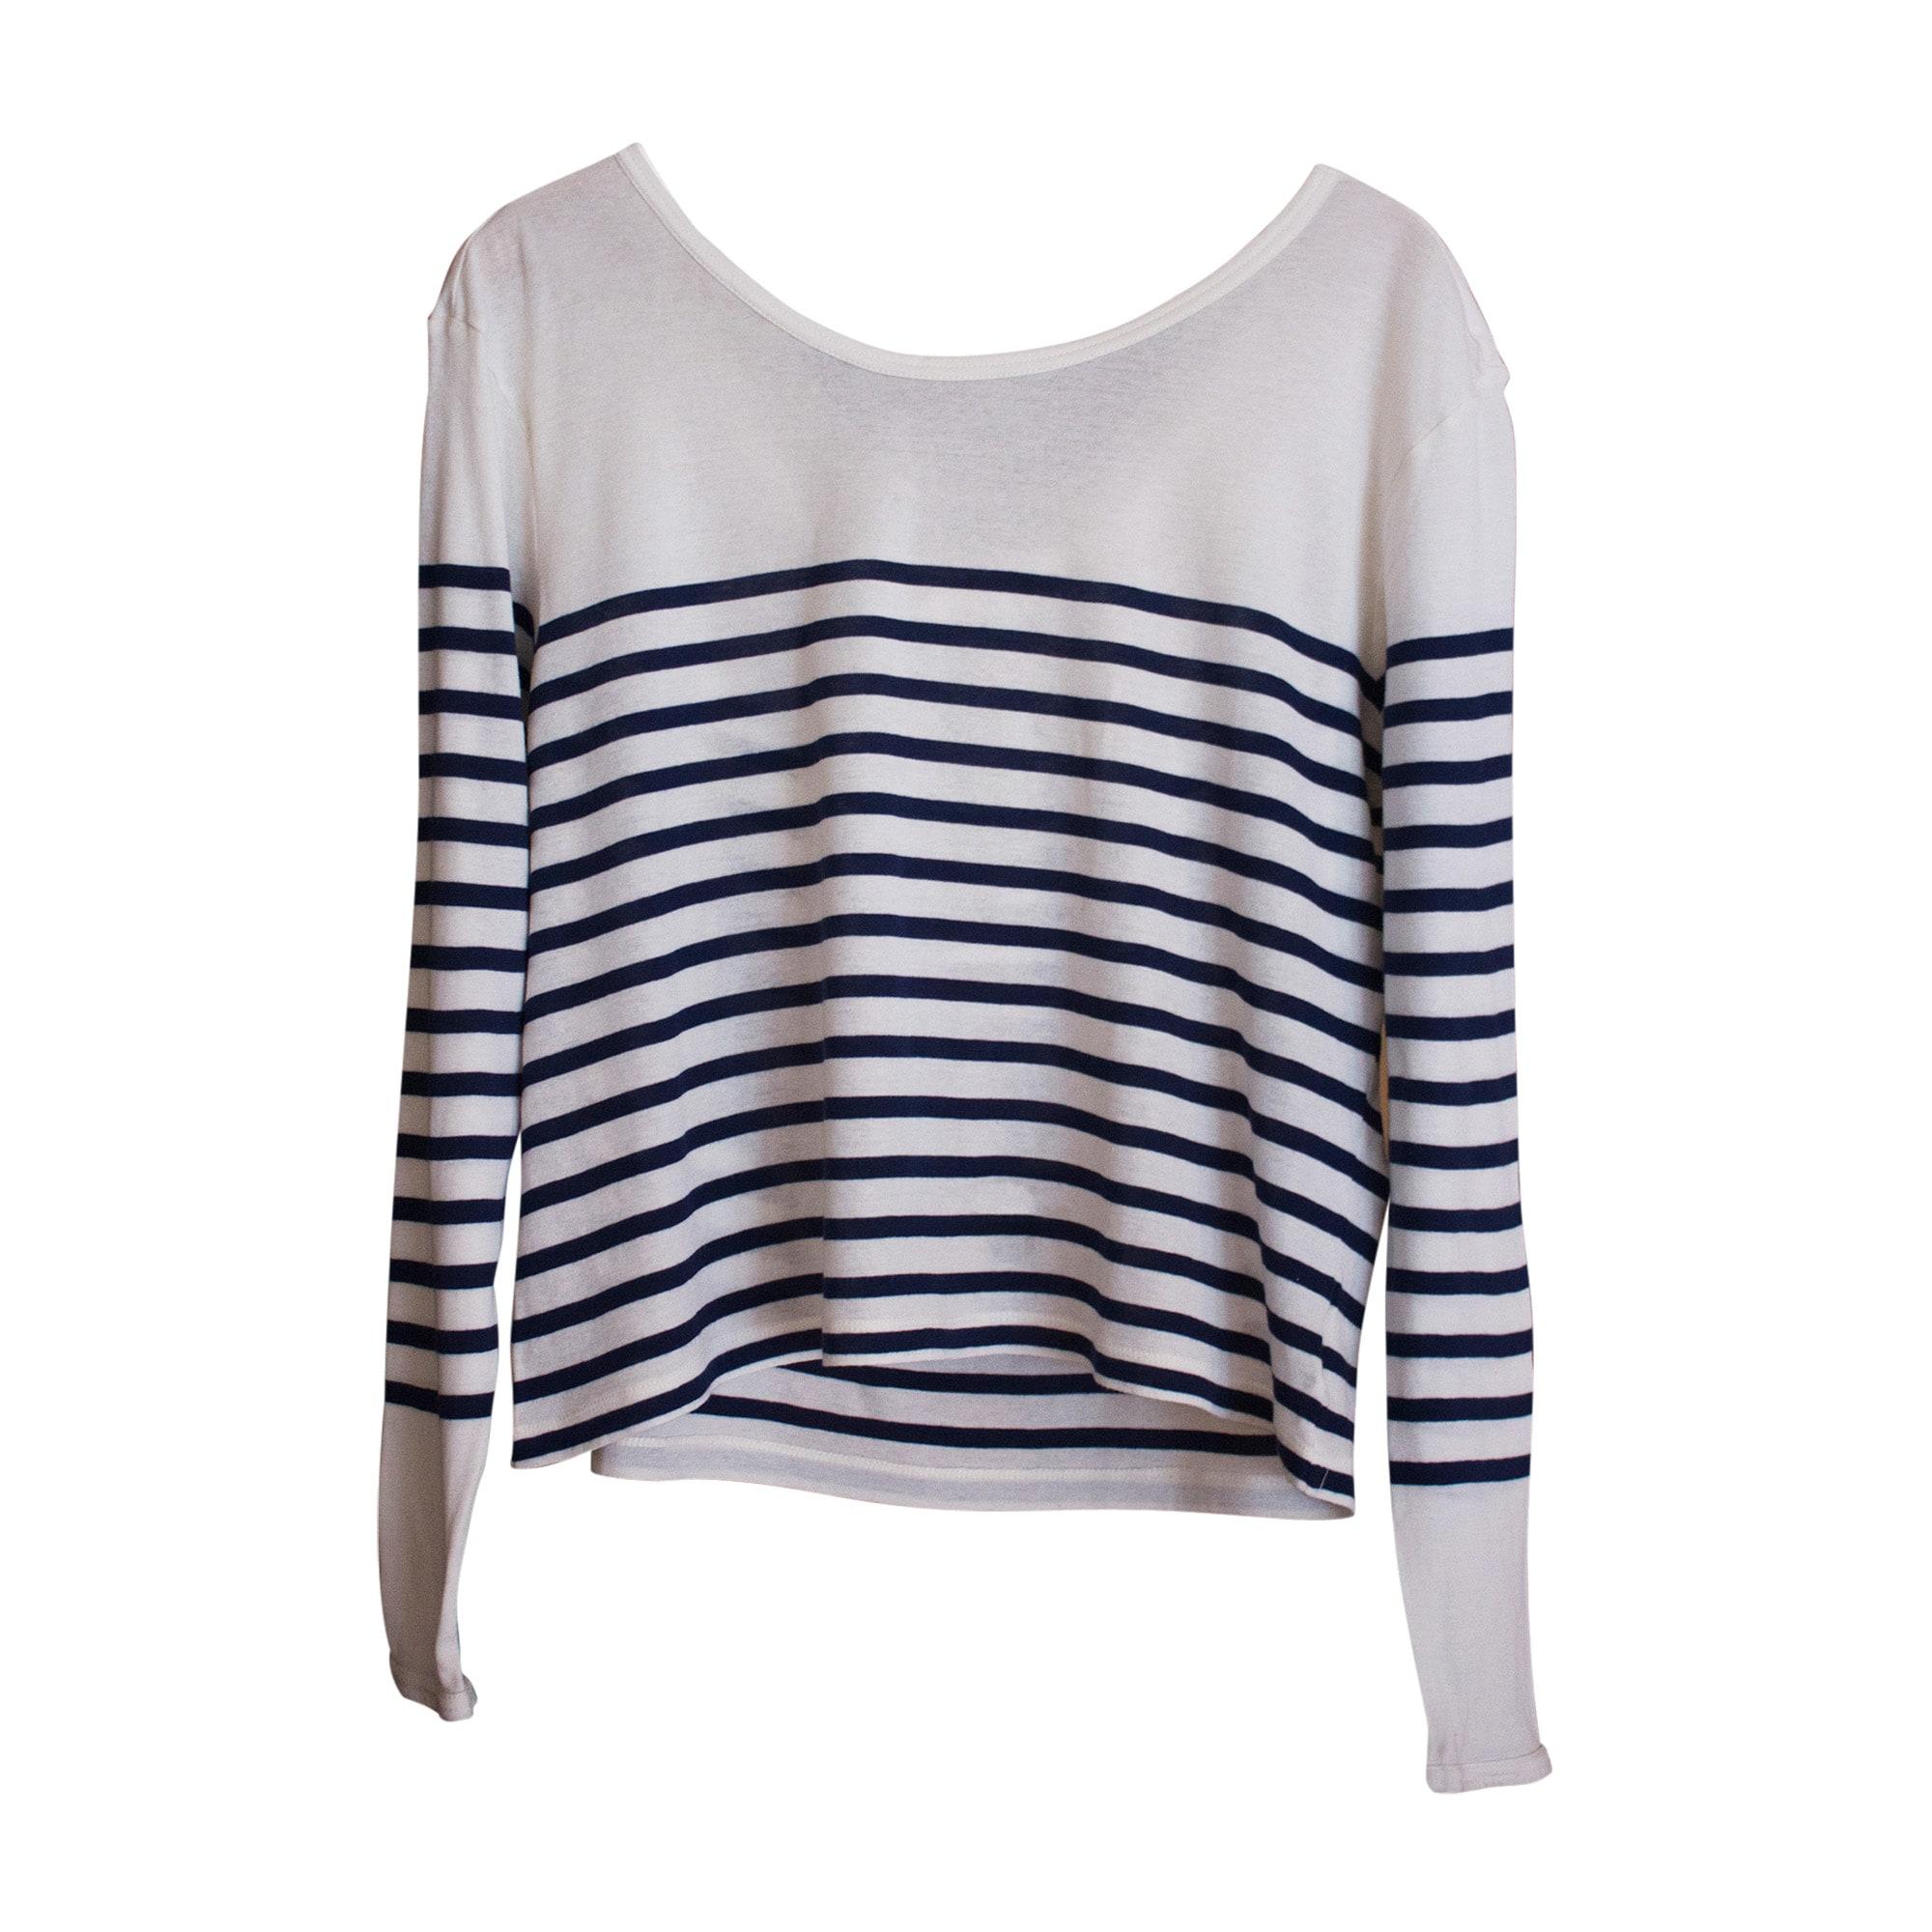 Tee-shirt JEAN PAUL GAULTIER 3 (L) blanc